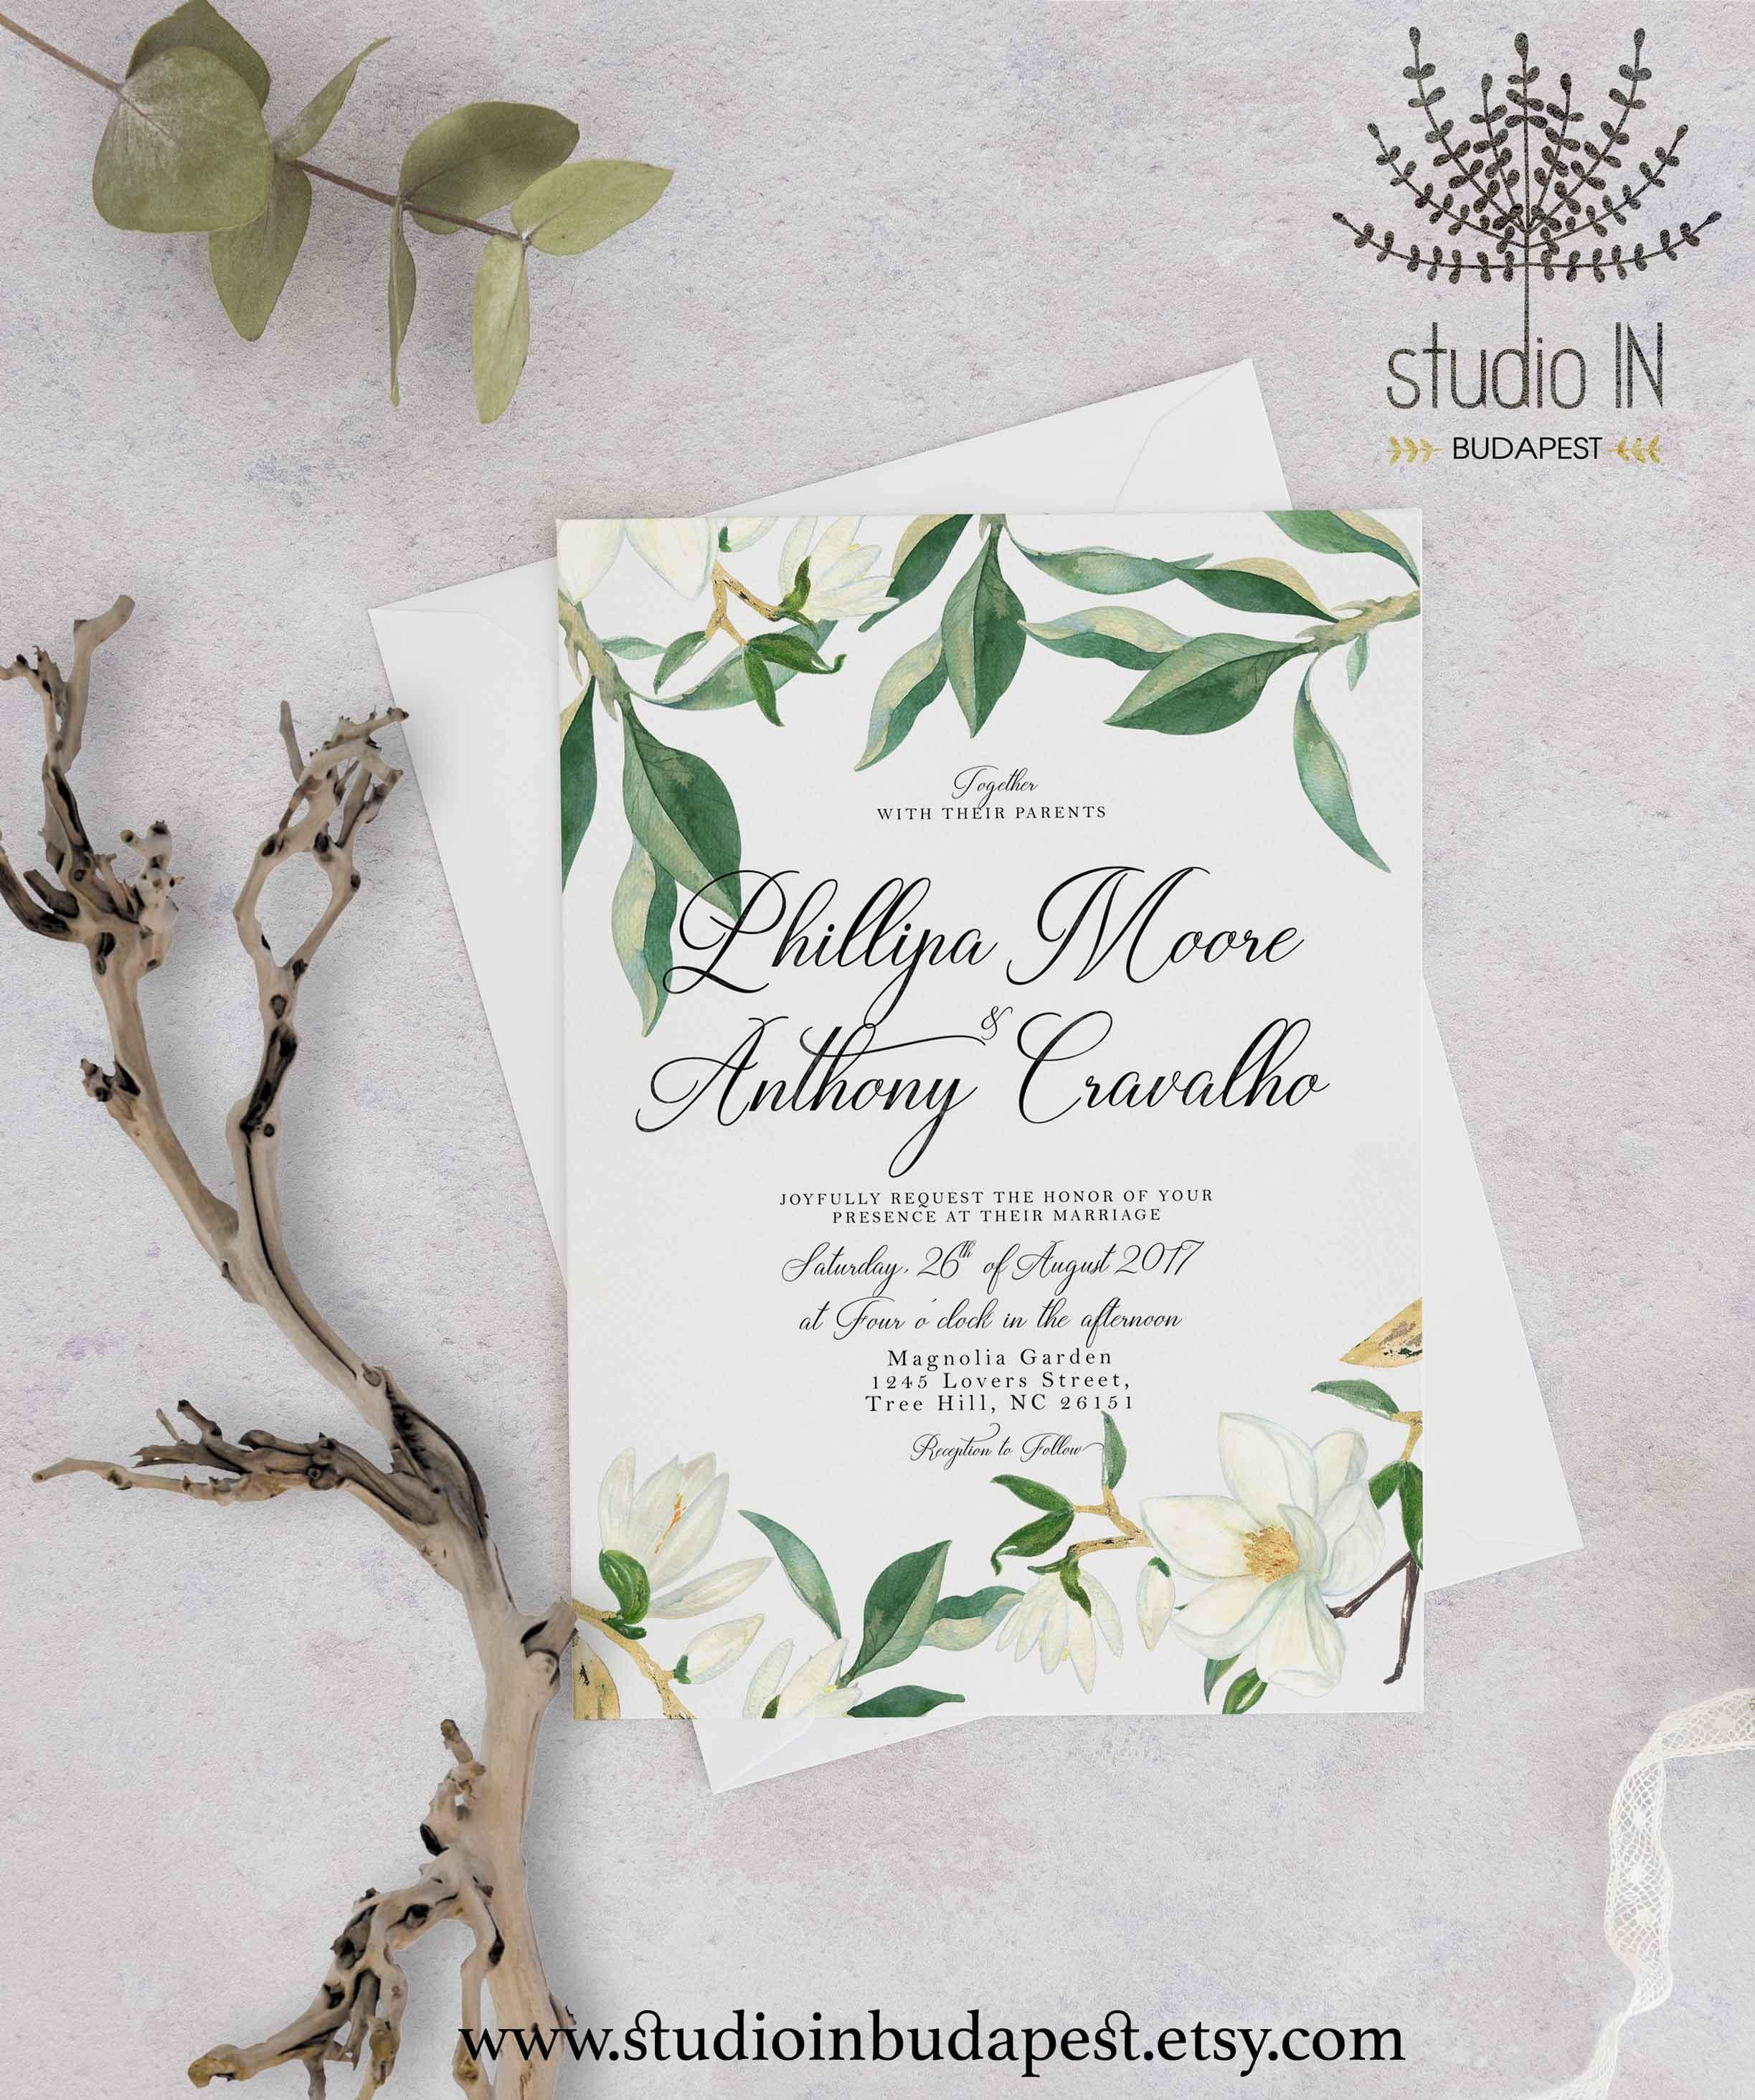 Green and Magnolia Wedding Invitation white floral wedding